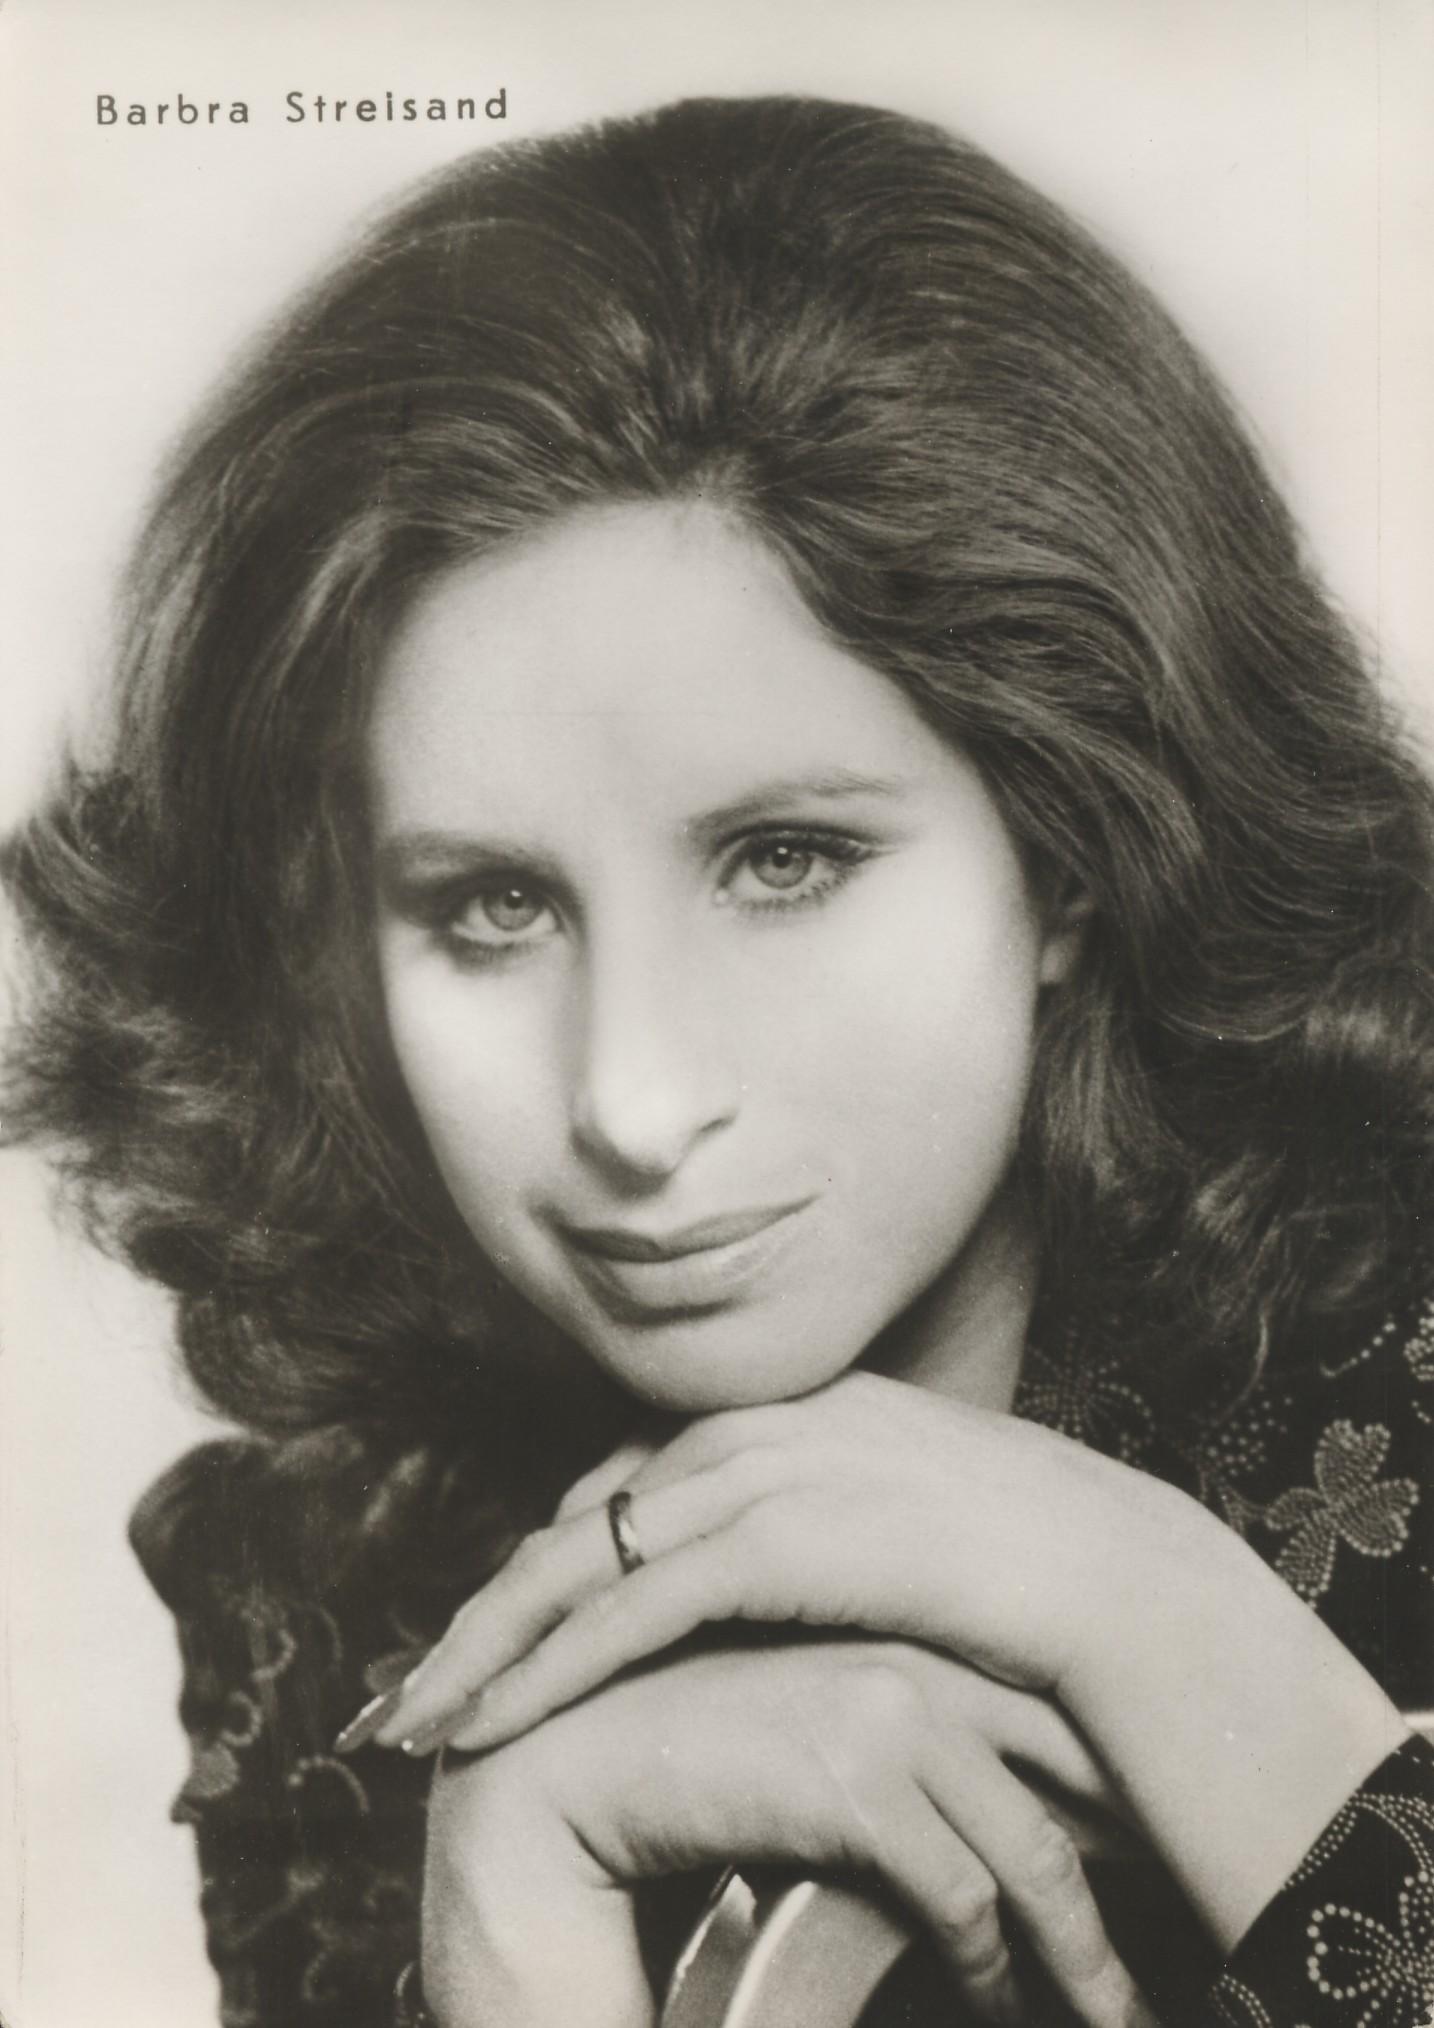 Barbra Streisand Photo 47 Of 52 Pics Wallpaper Photo